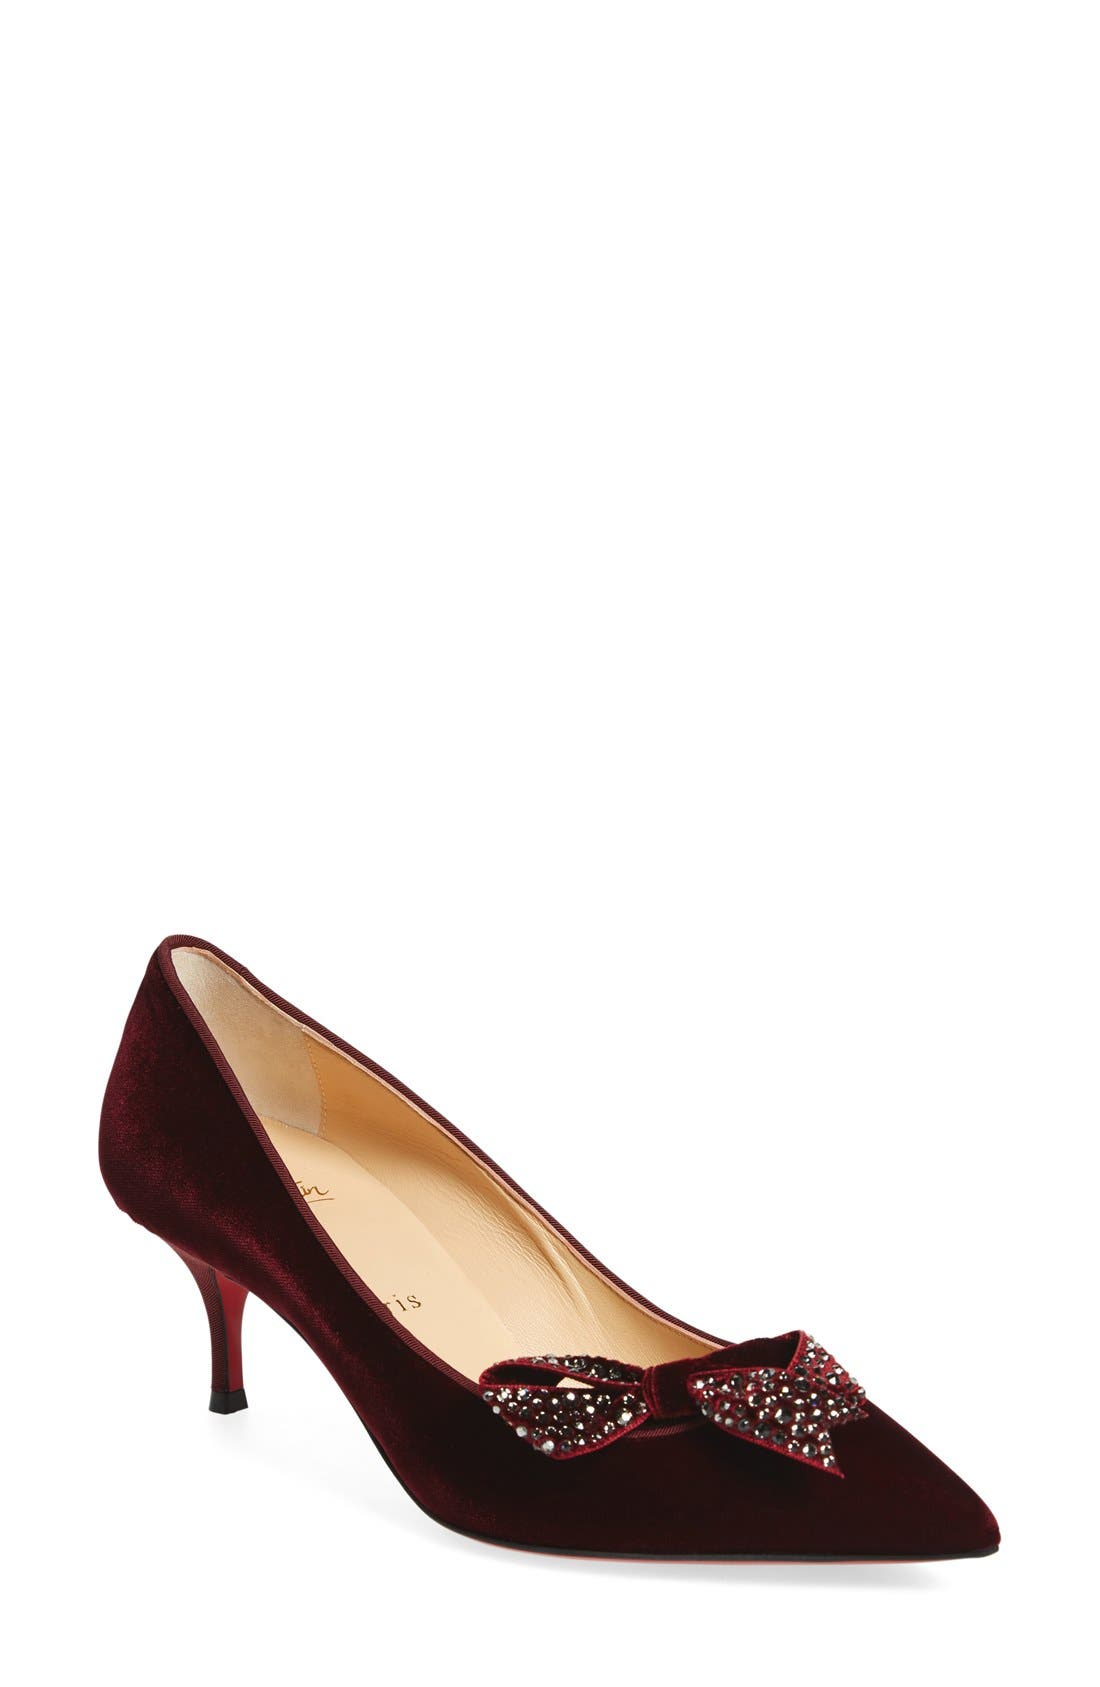 Christian Louboutin 'Mlle Menule' Embellished Bow Kitten Heel Pump